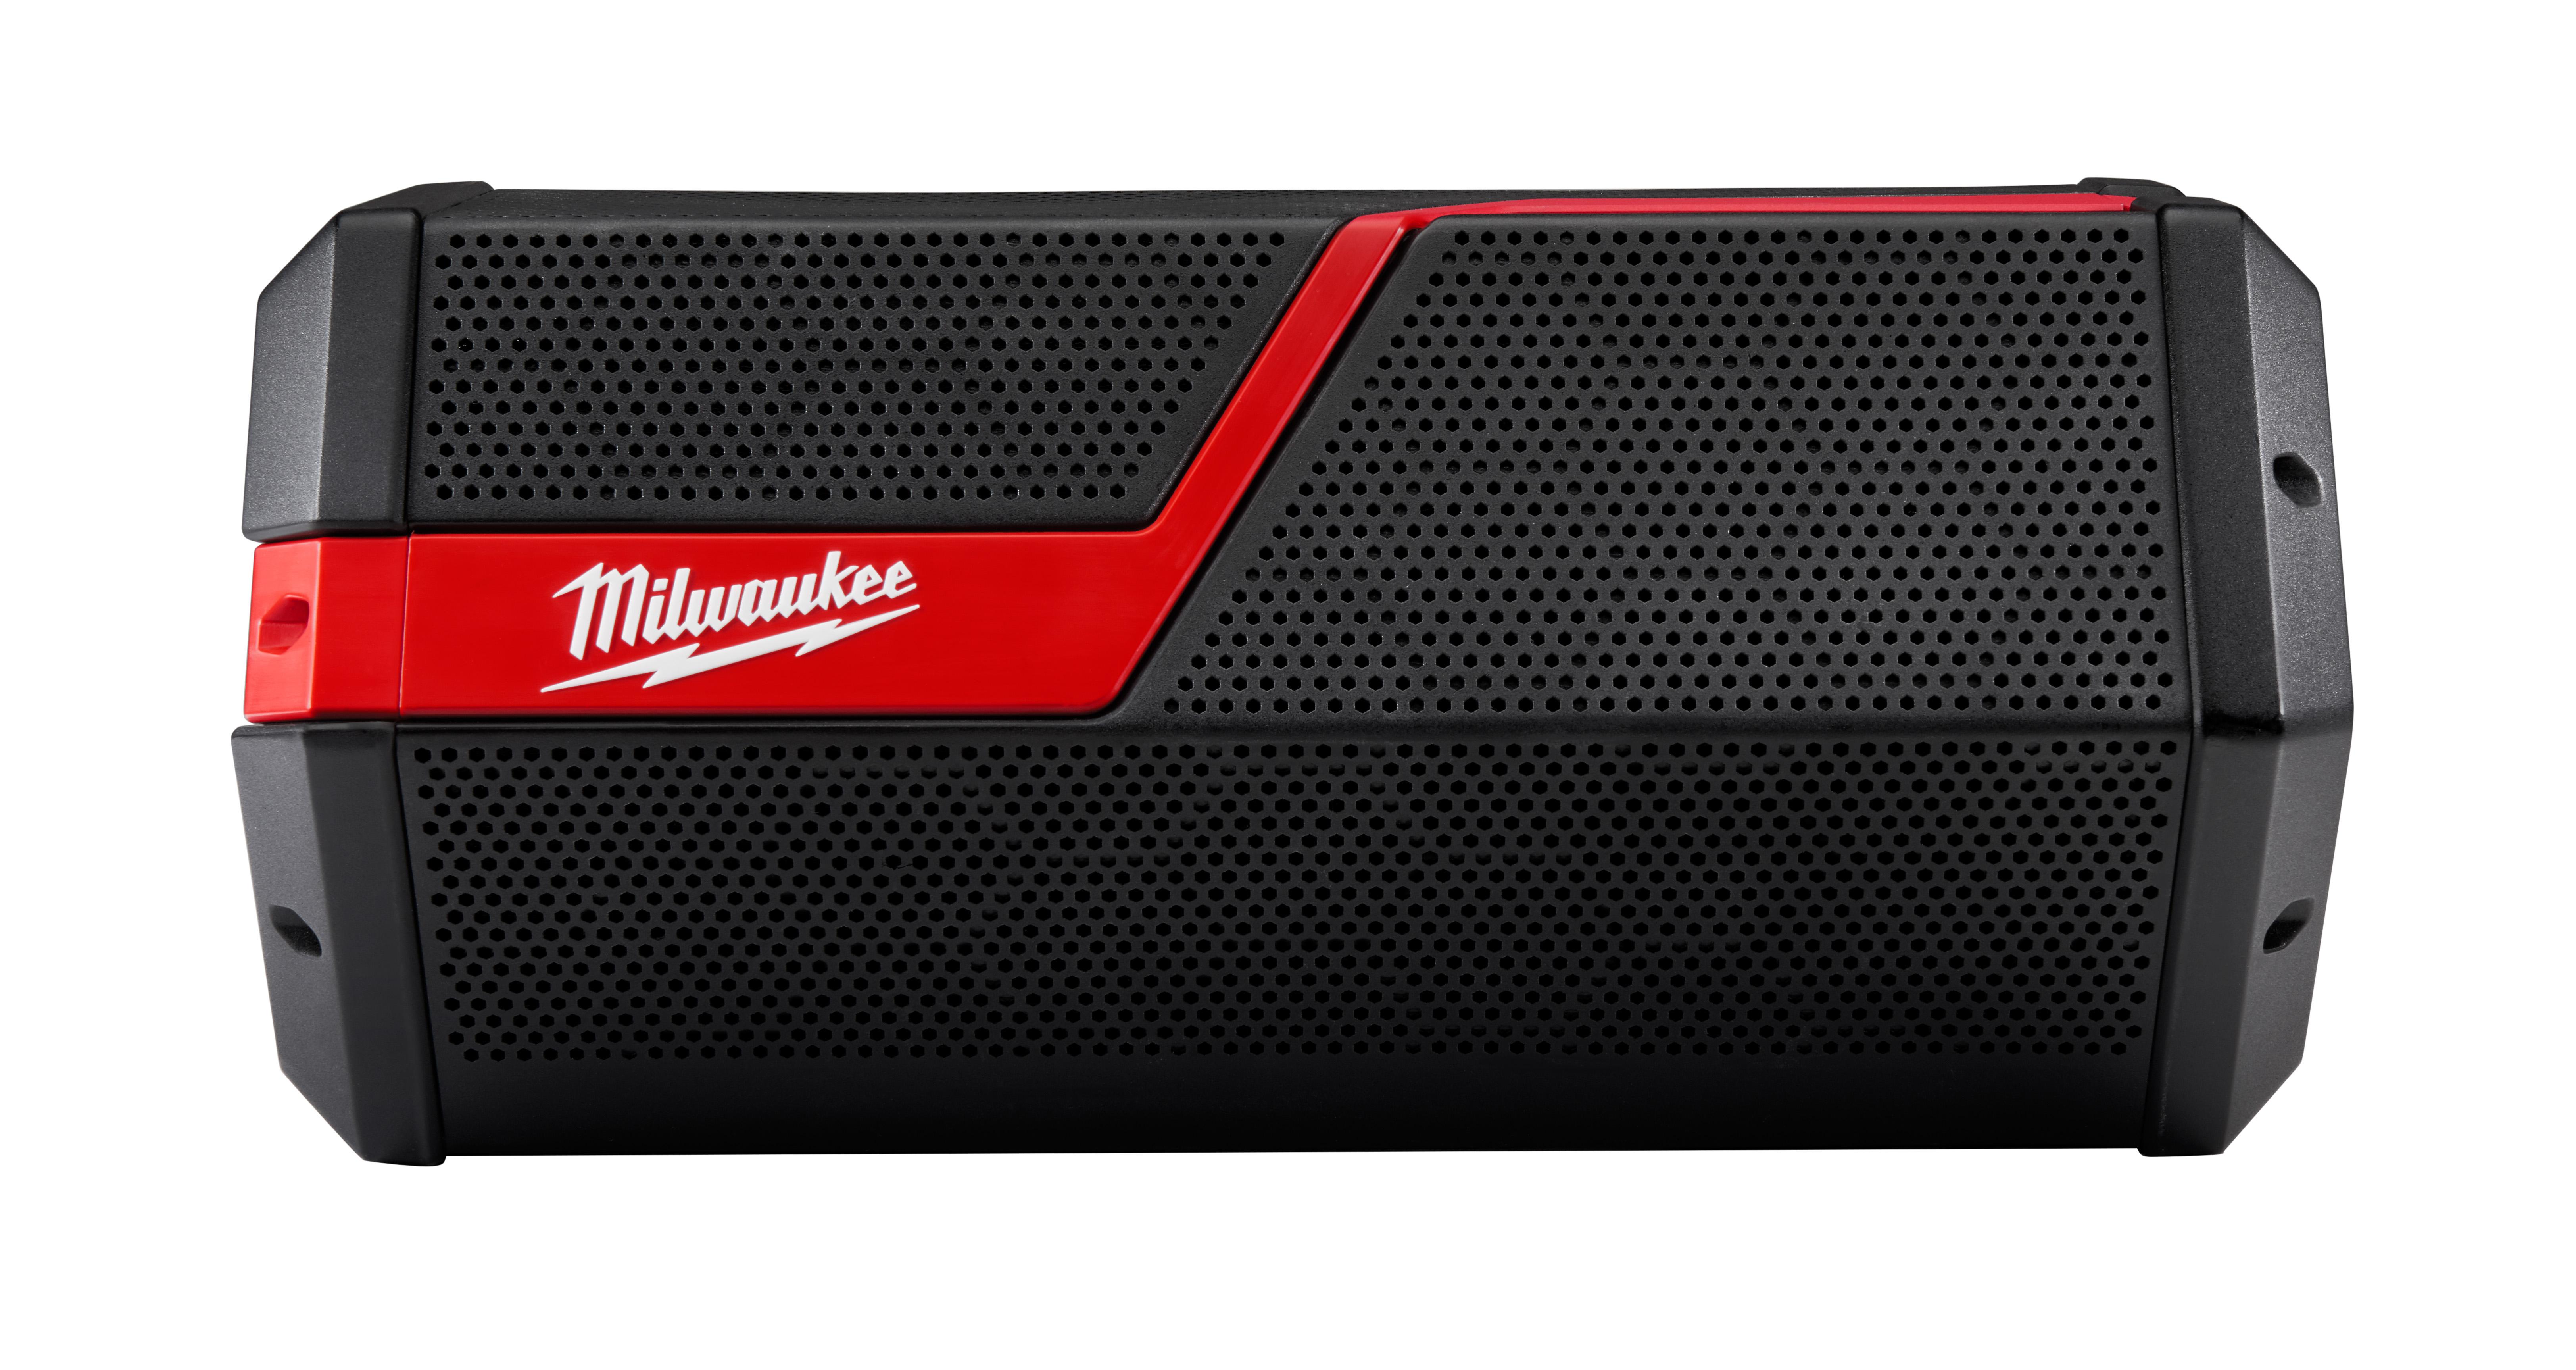 M18/M12 18 Volt 12 Volt Lithium-Ion Cordless Wireless Jobsite Speaker - Tool Only